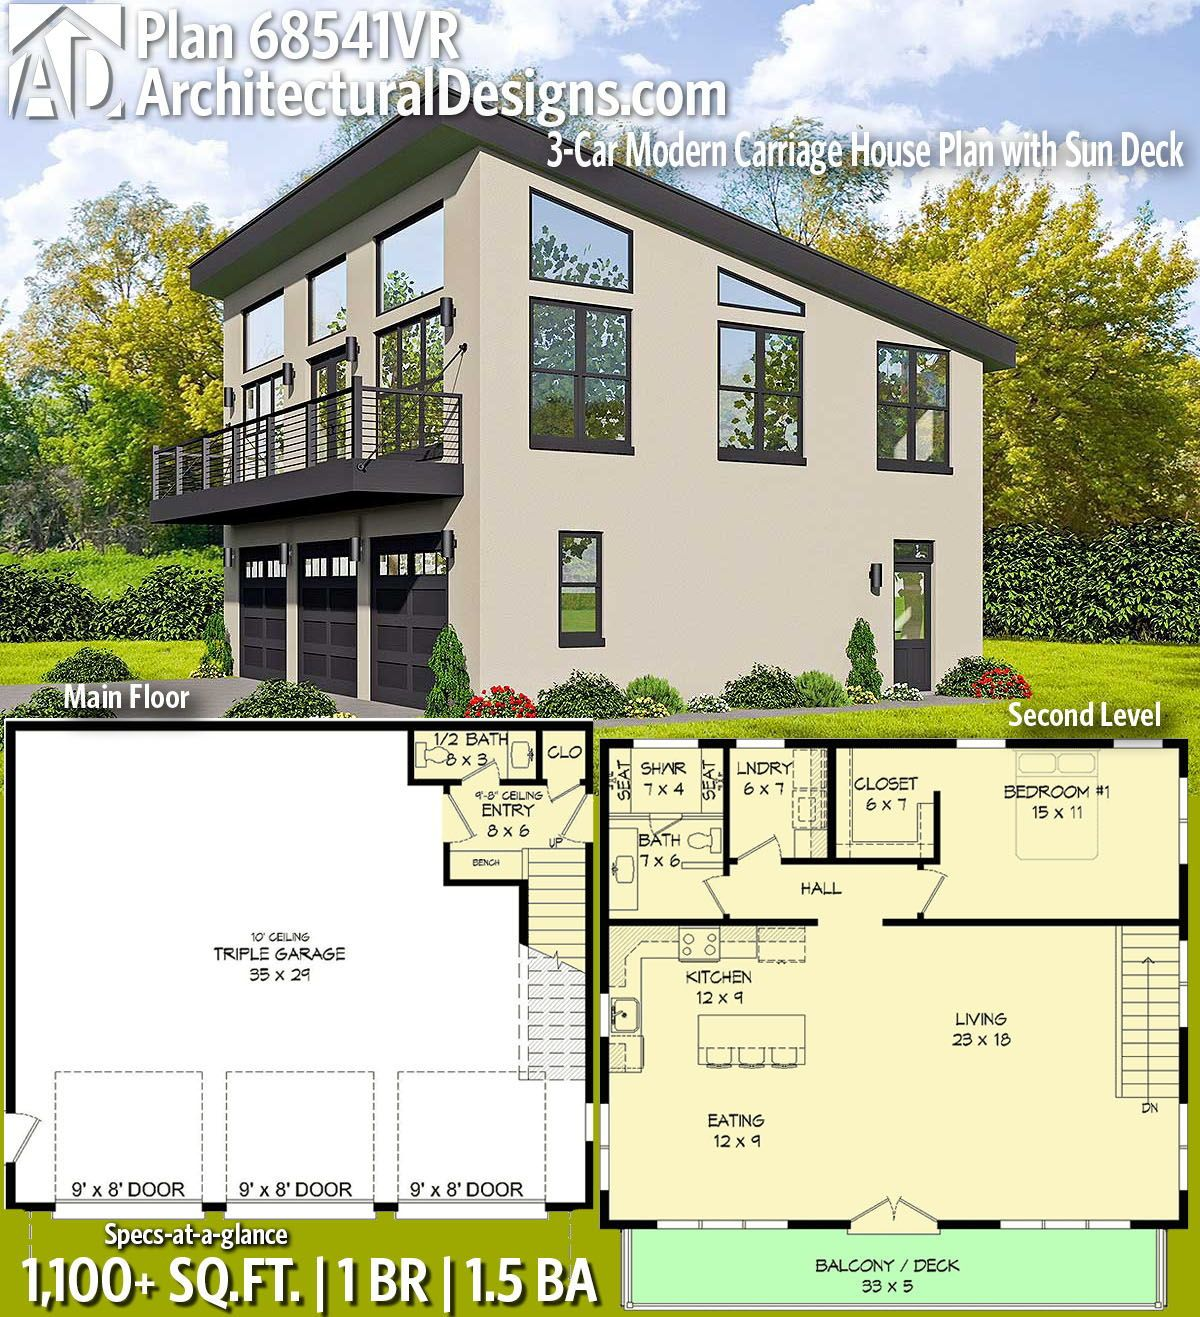 Plan 68541VR: 3-Car Modern Carriage House Plan With Sun